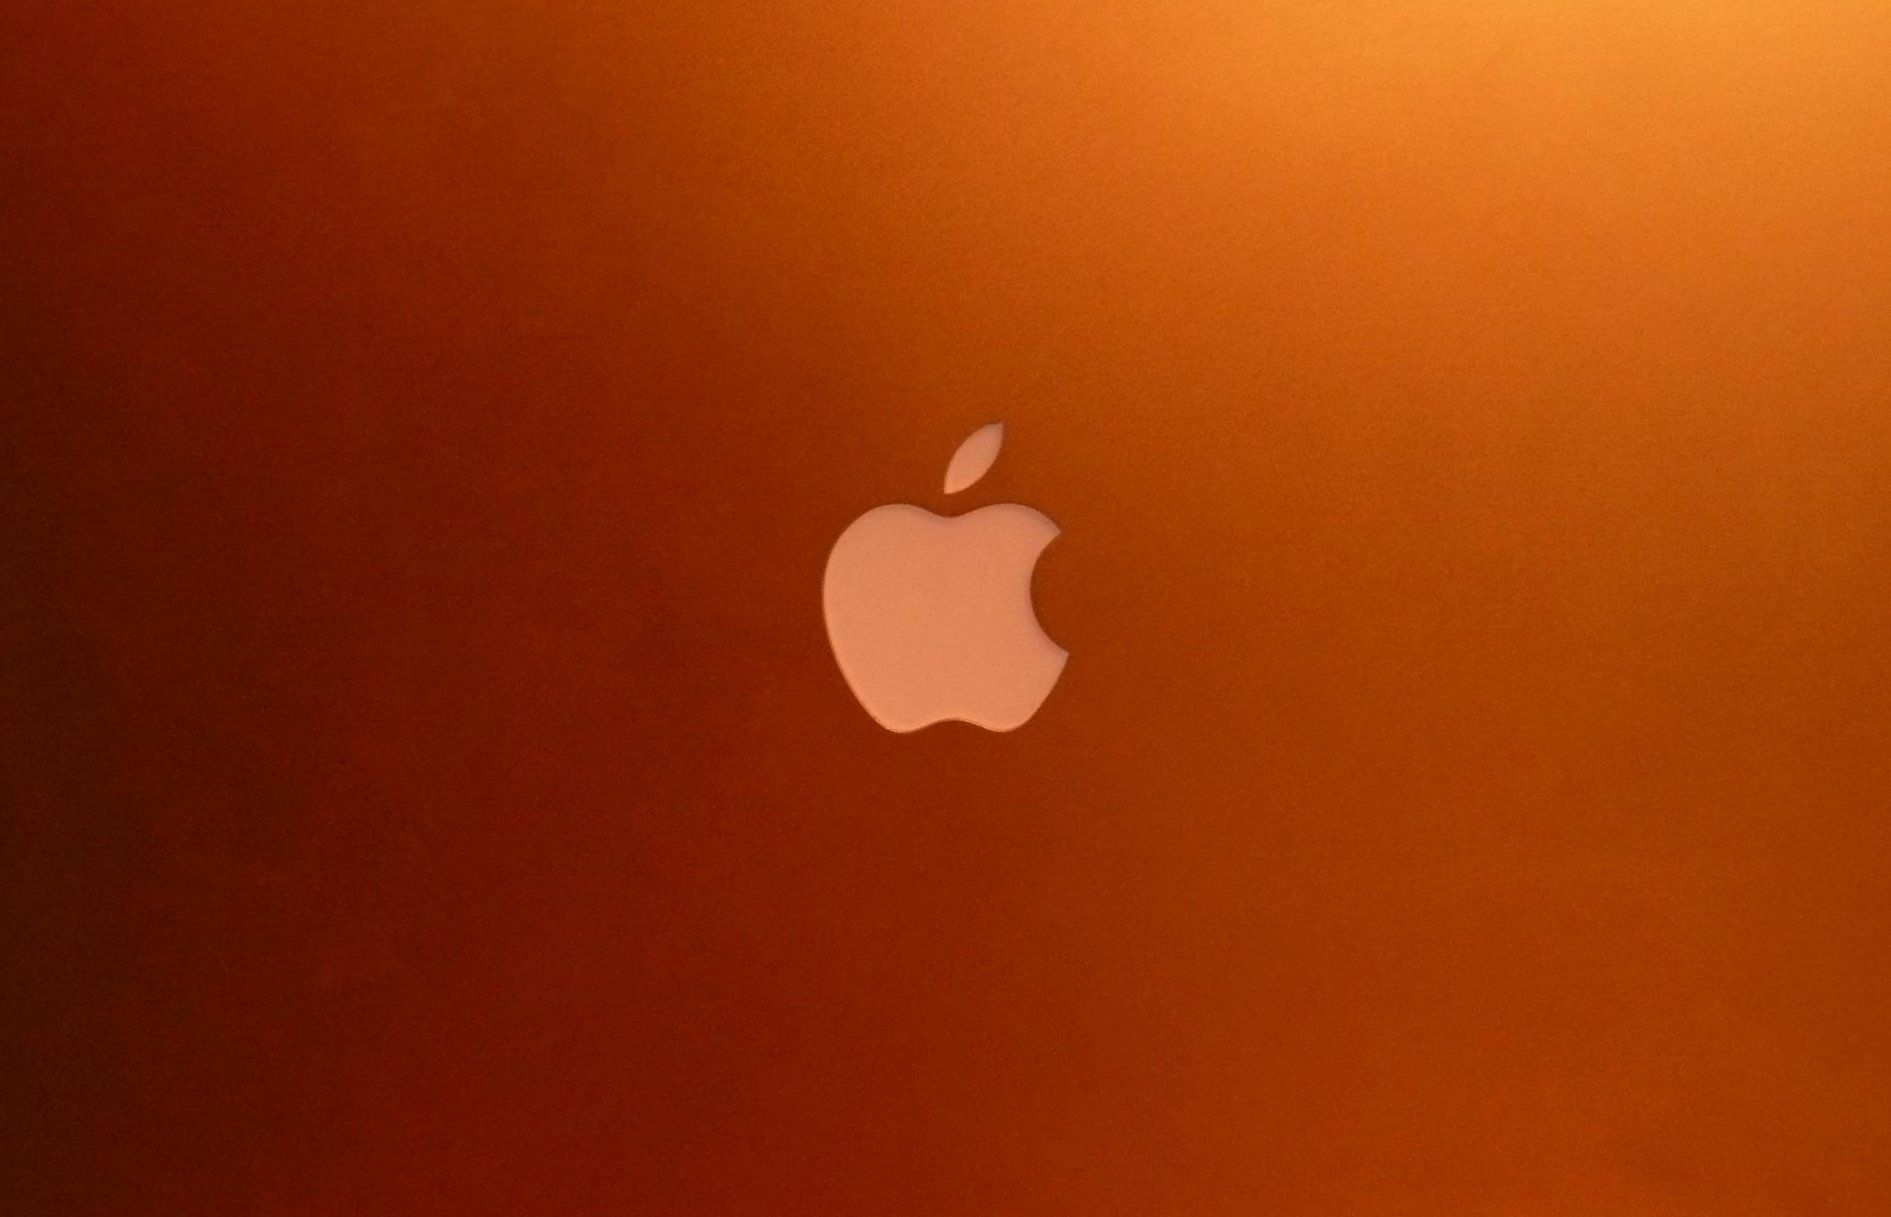 Orange Apple Water Splash Wallpaper HD Of Fresh Fruits 1600x900 Wallpapers 42